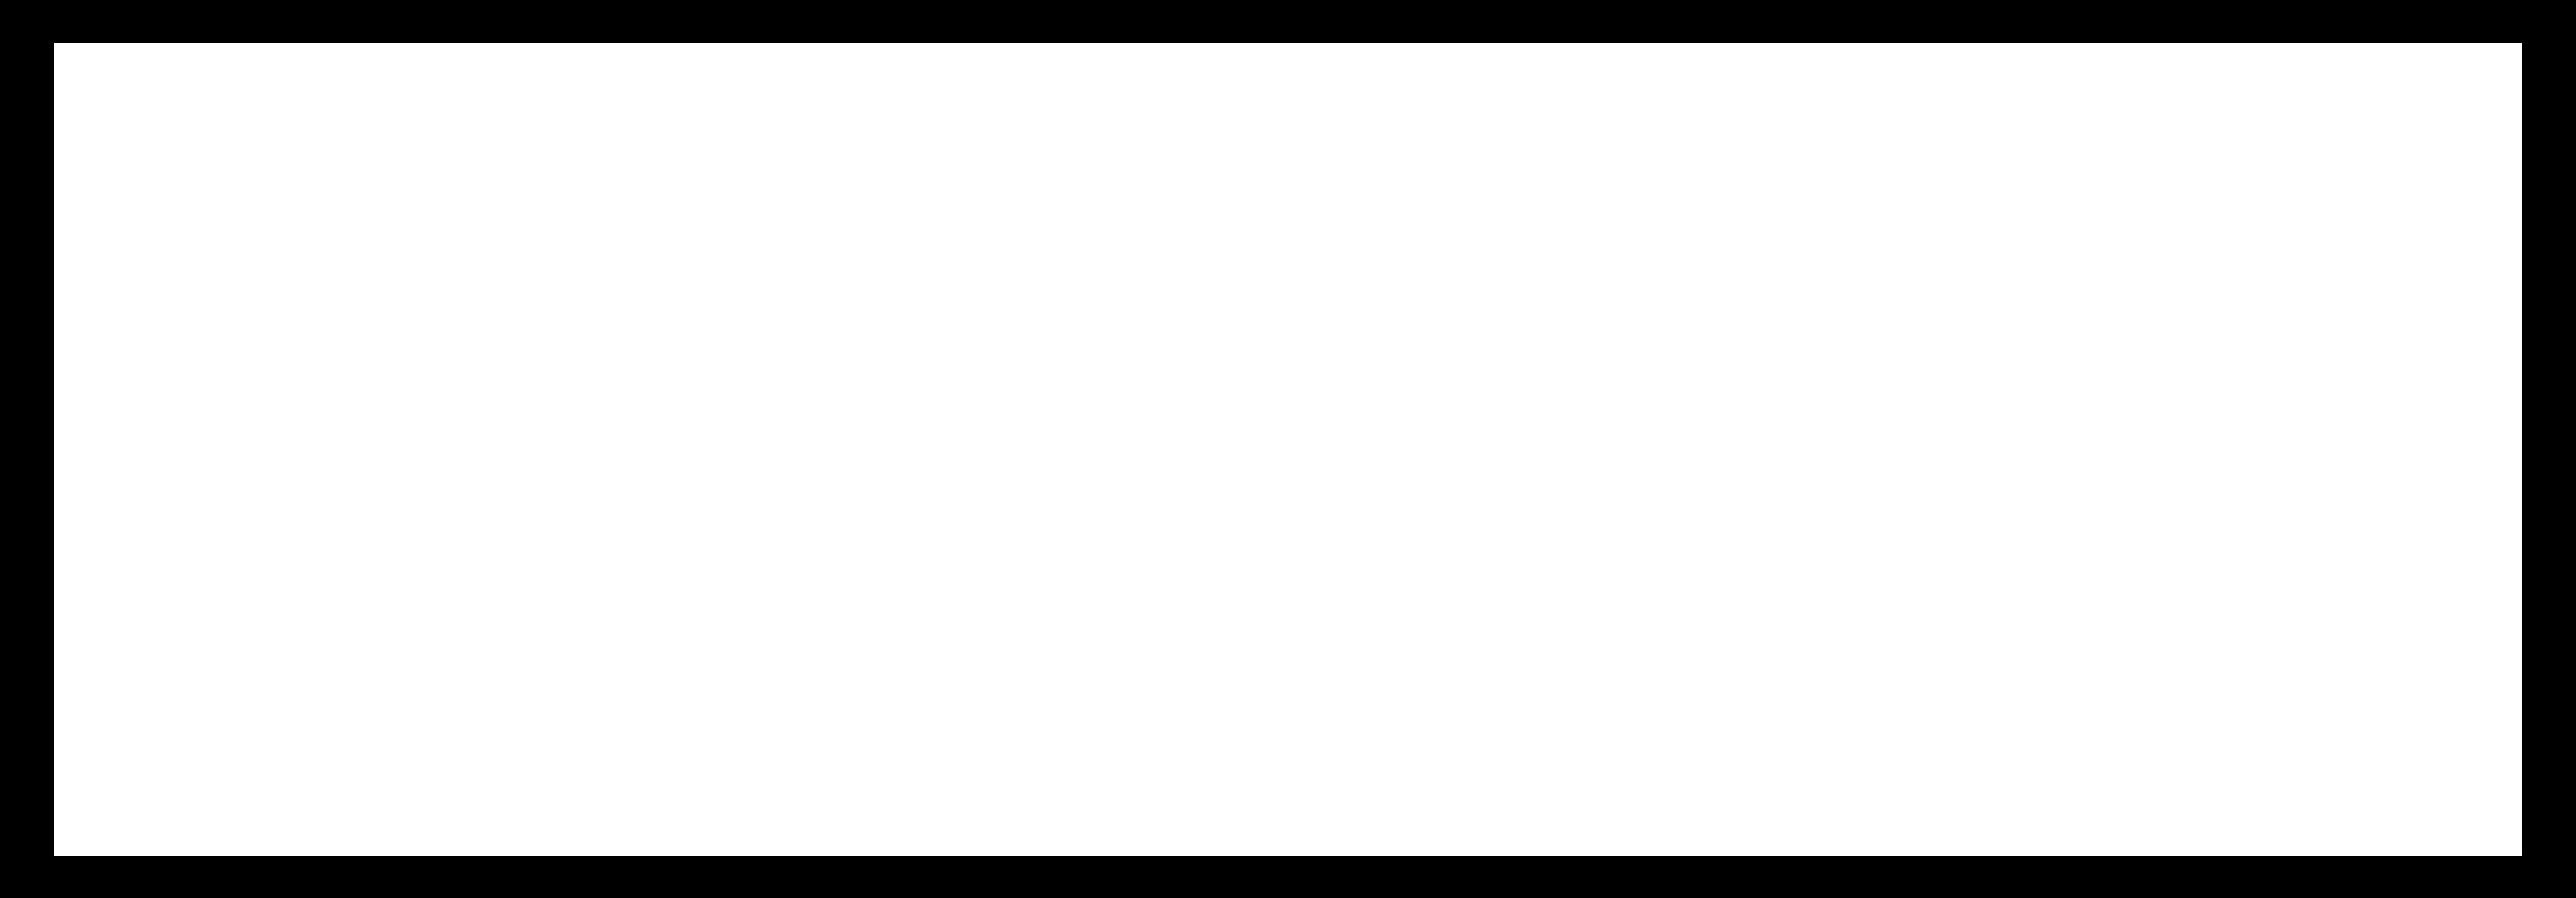 RBR white logo